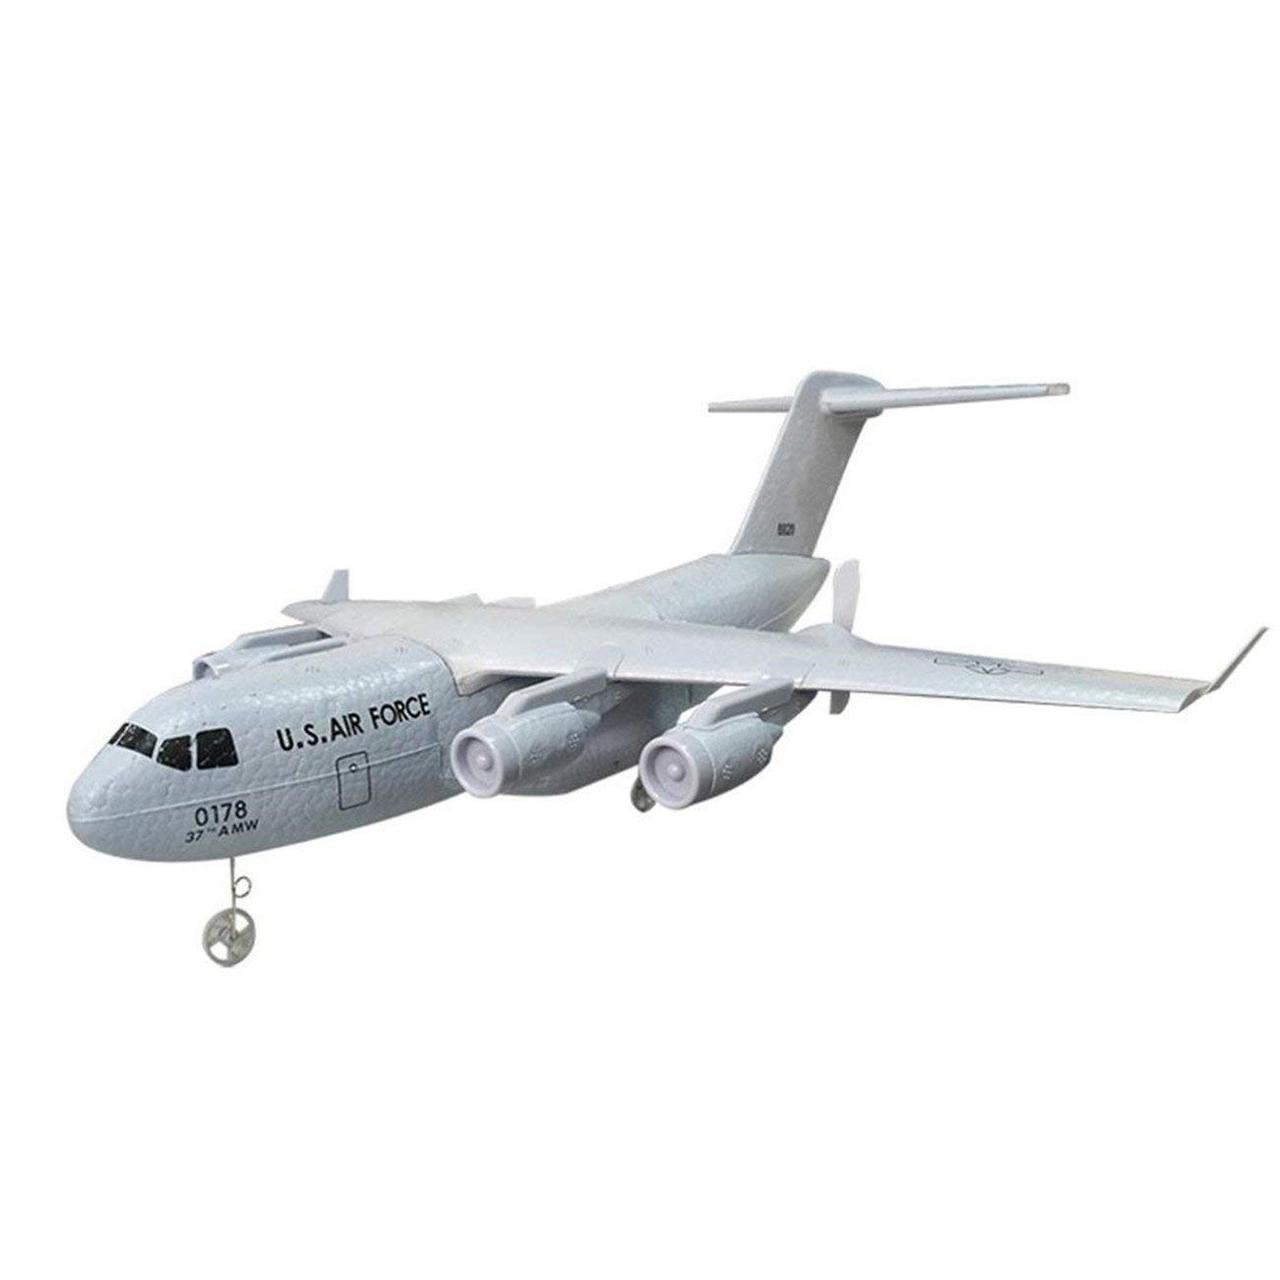 Літак на радіоуправлінні. Конструктор з EPP. Клей для EPP в подарунок